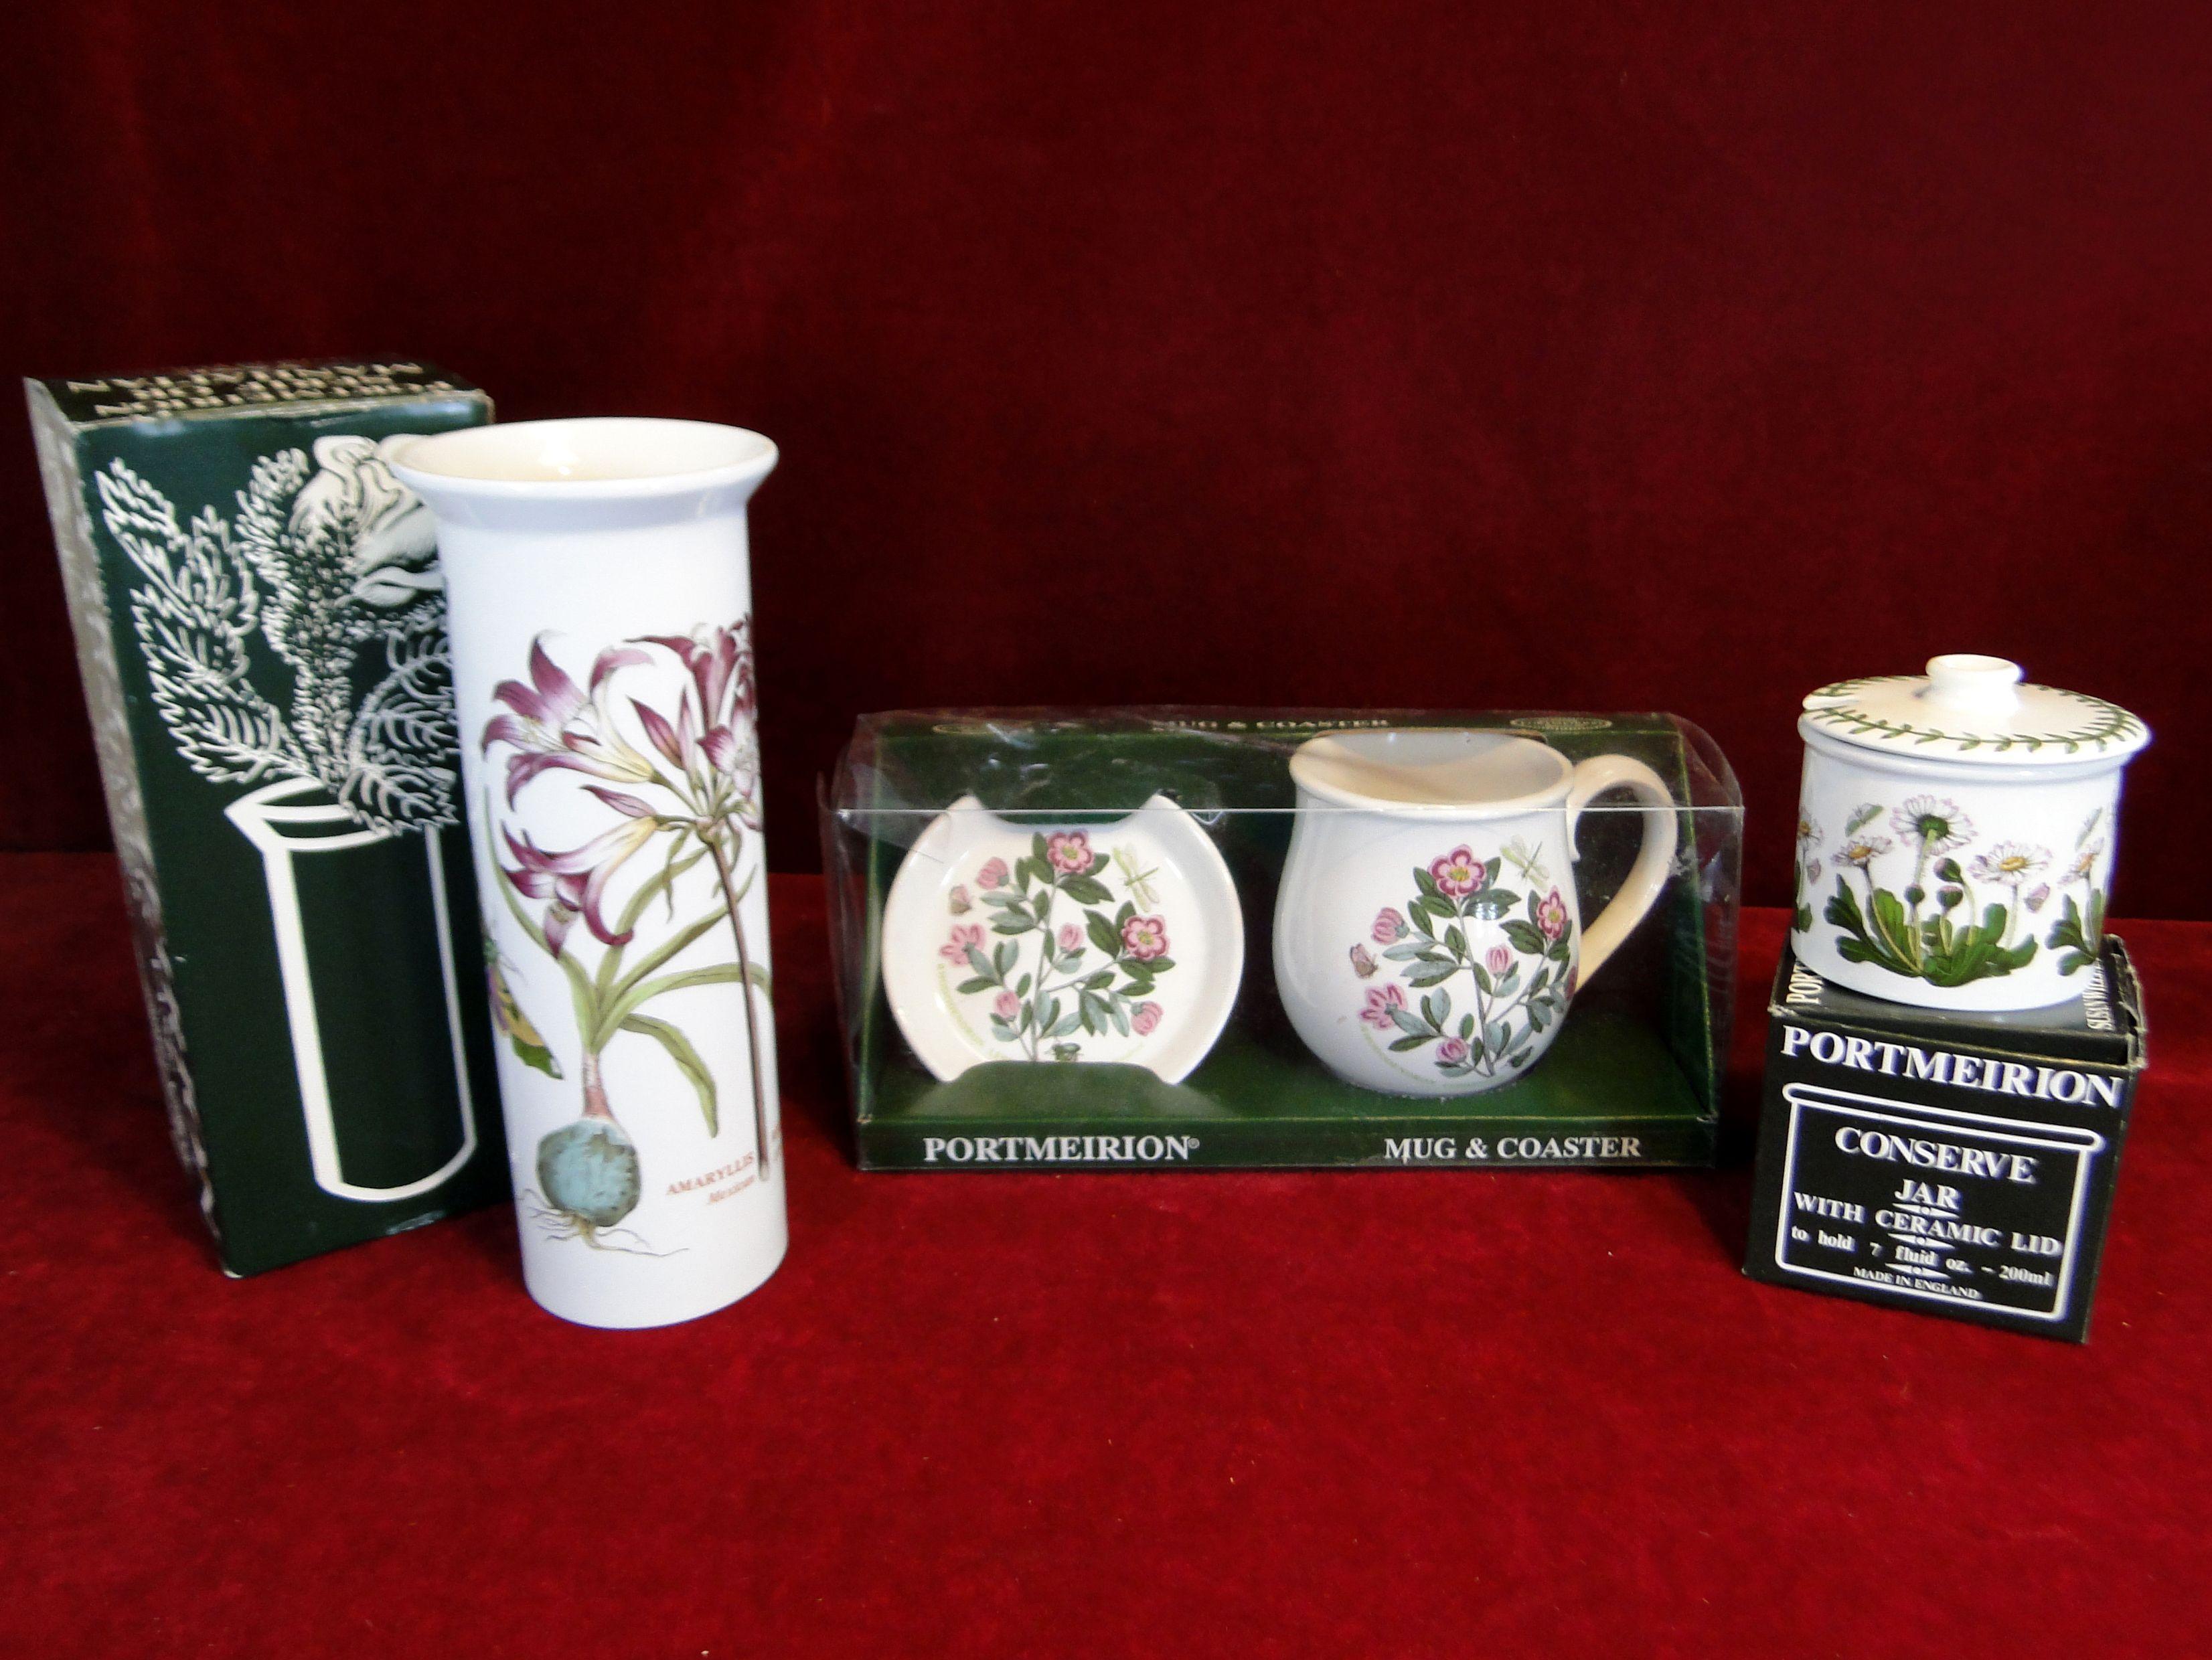 63) Portmeirion Manhattan vase, conserve jar, mug and coaster all new in boxes Est. £15-£25